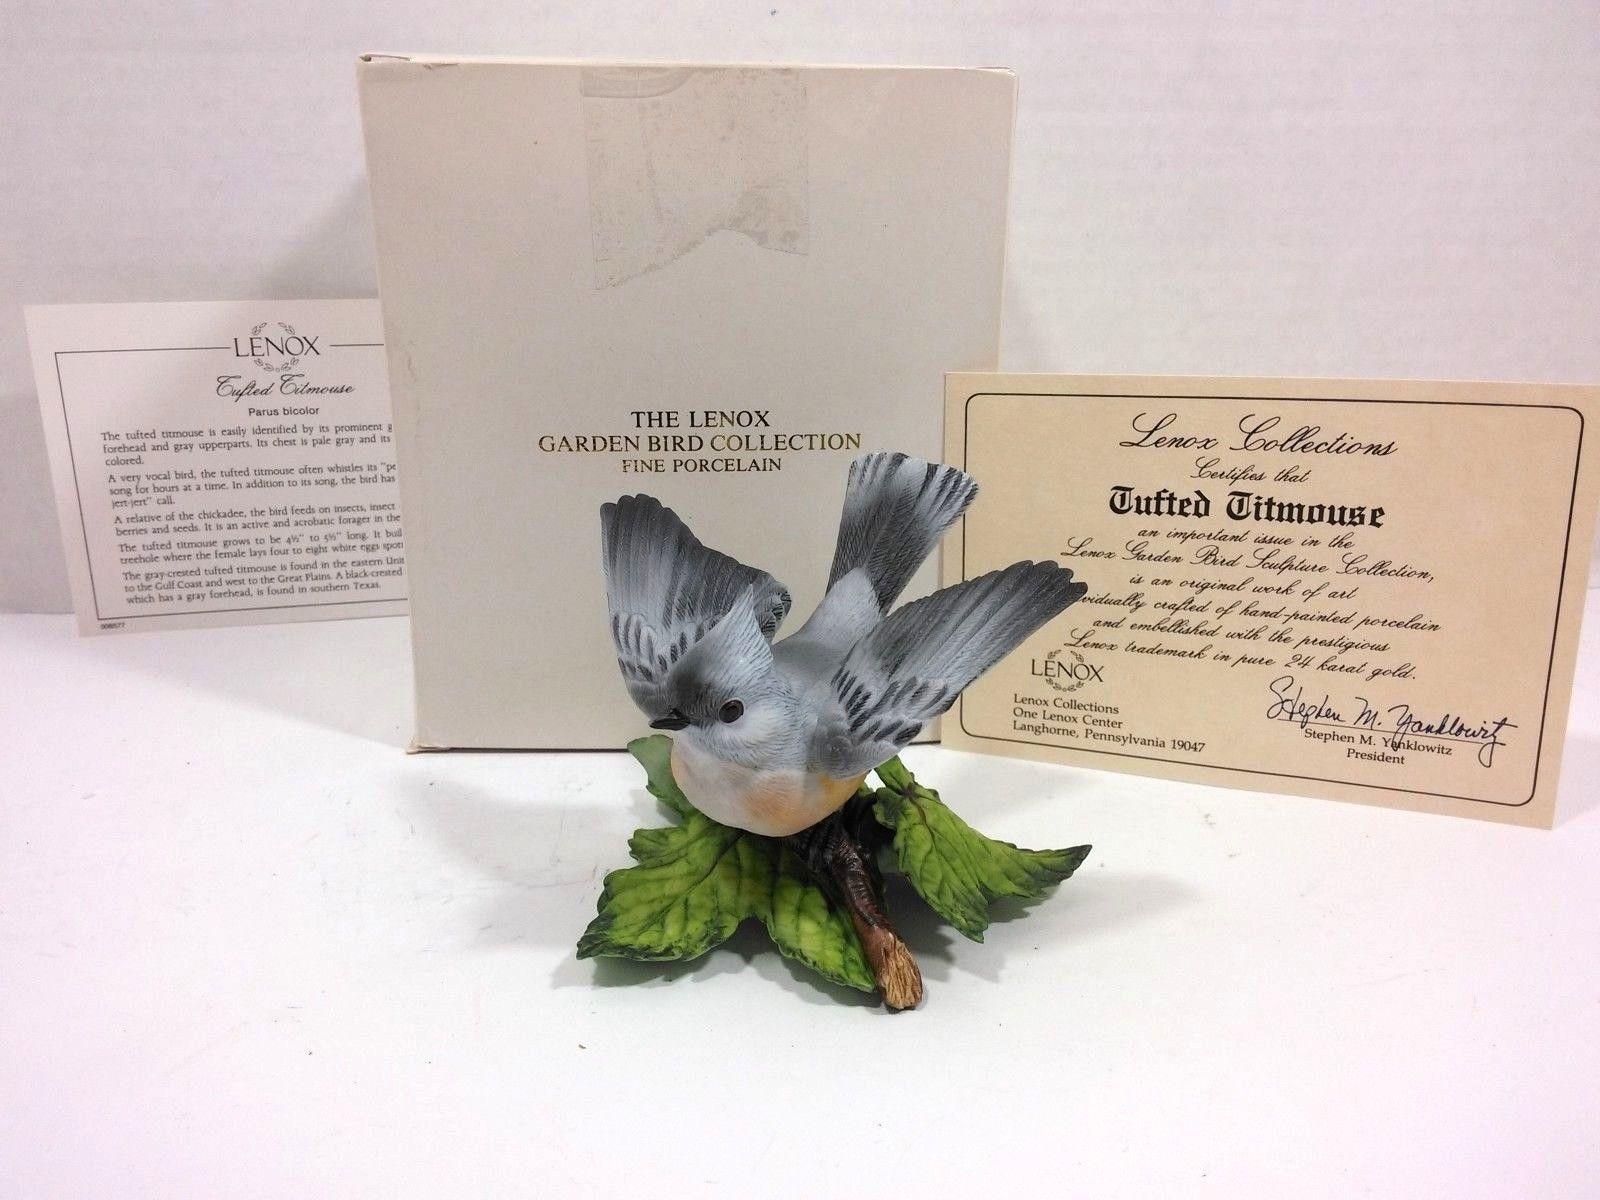 THE LENOX GARDEN BIRD COLLECTION Tufted Titmouse (Fine Porcelain 1986) image 2